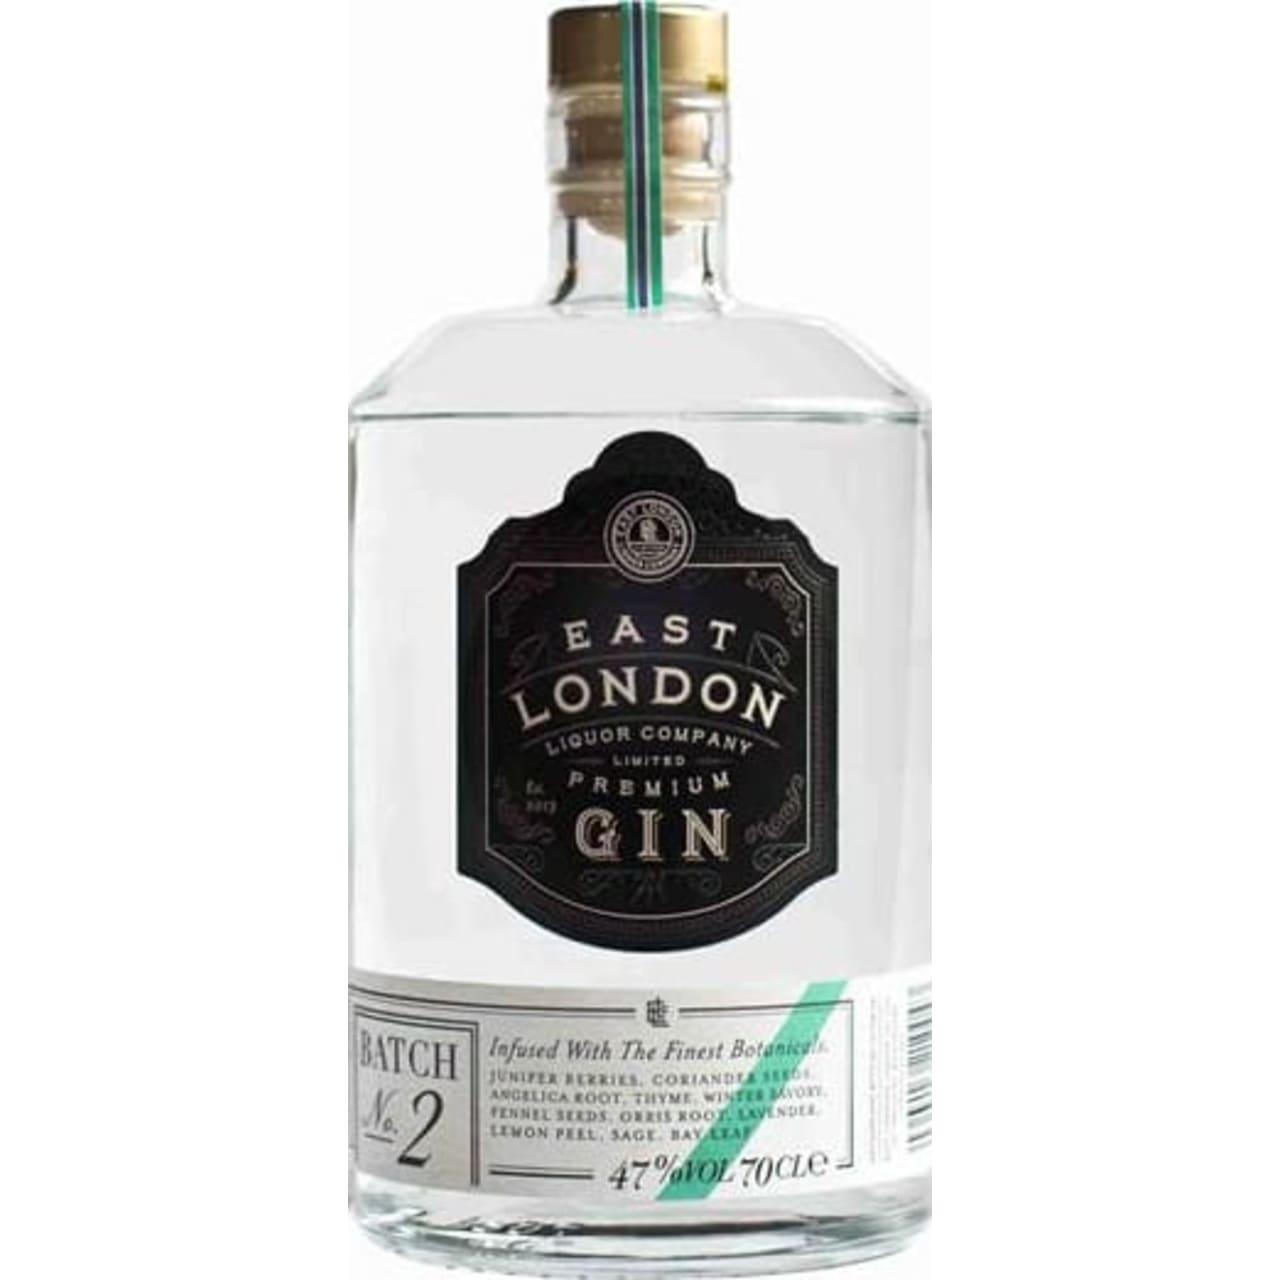 Product Image - East London Liquor Company Premium Gin Batch No.2